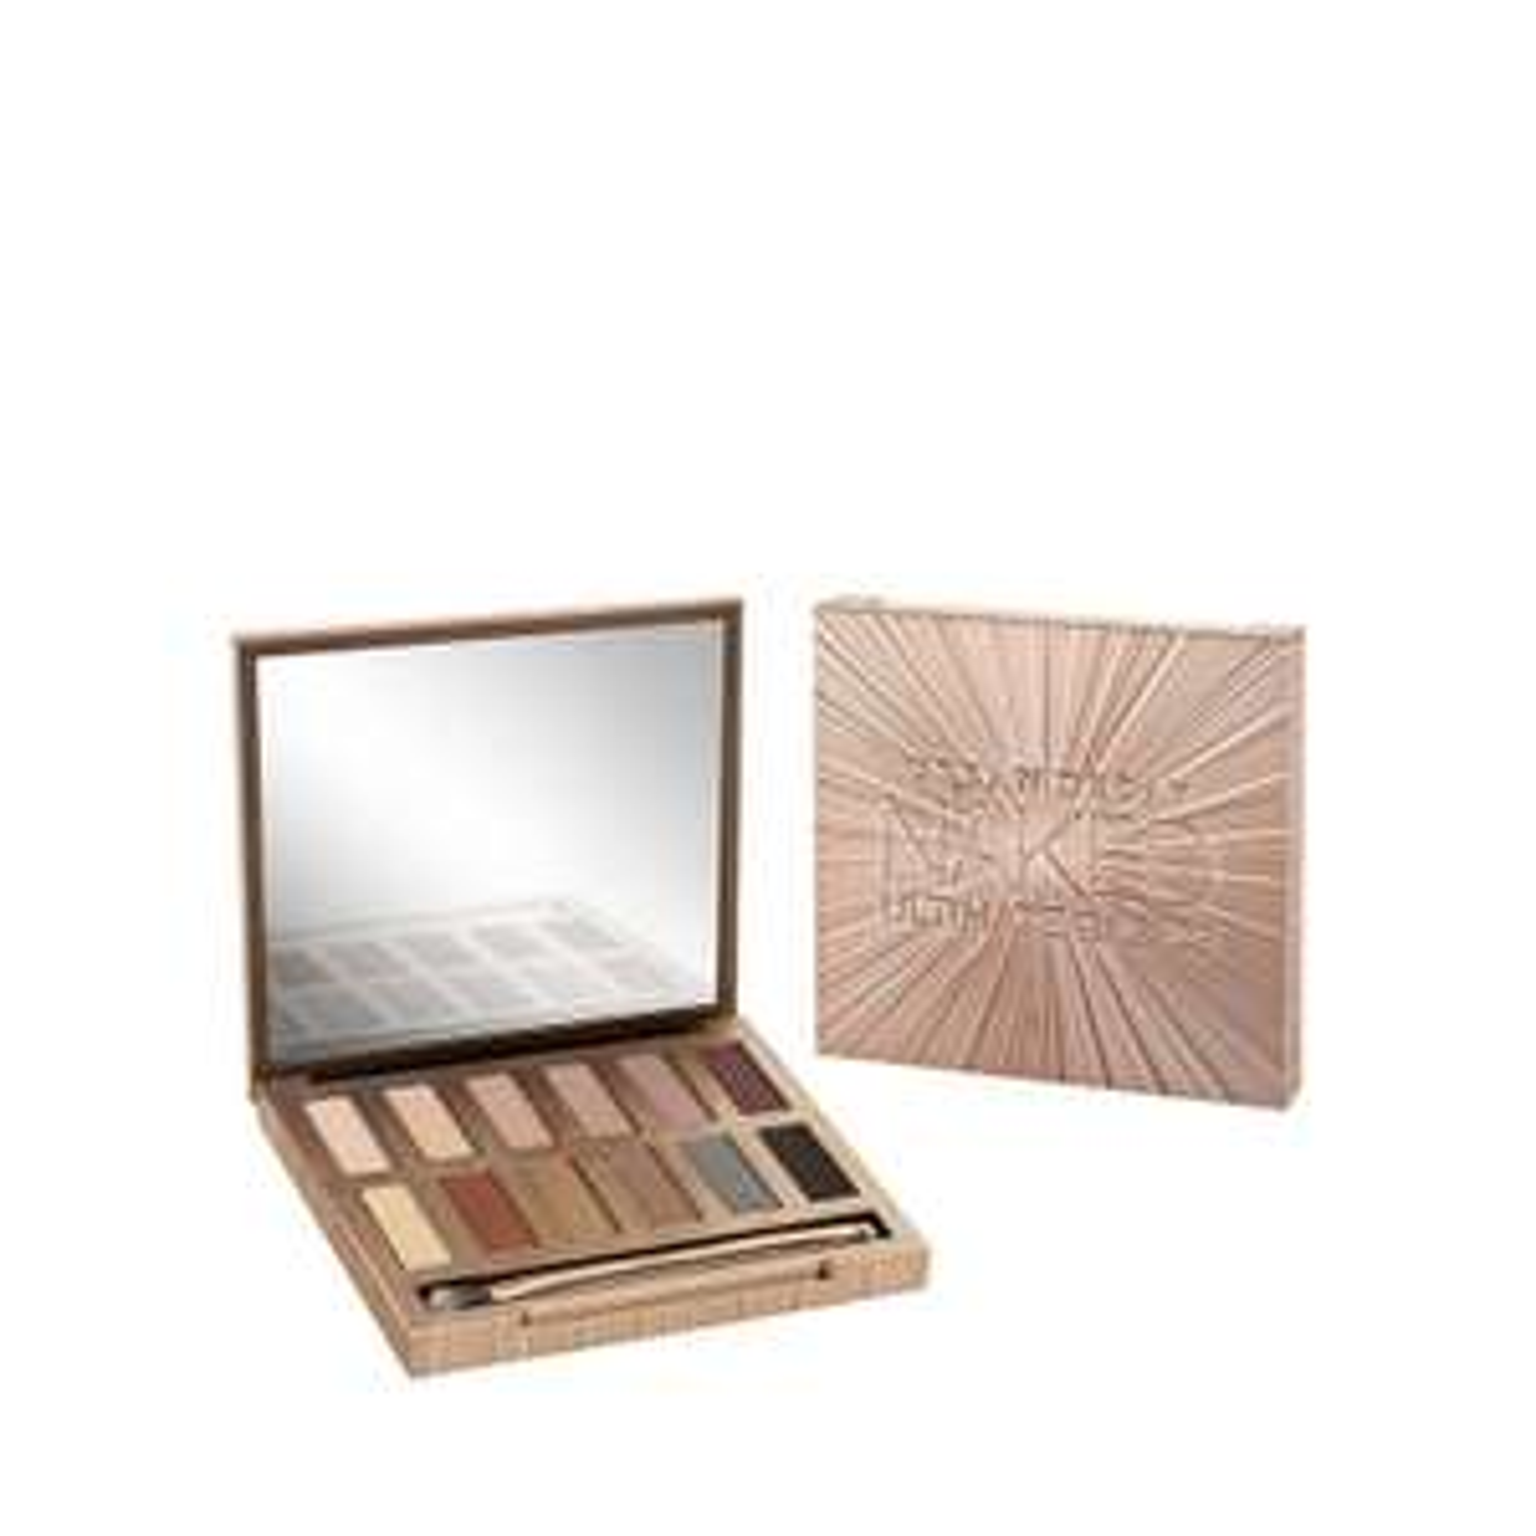 Urban Decay - 'Naked Ultimate Basics' eyeshadow palette £21 delivered (use code) at Debenhams